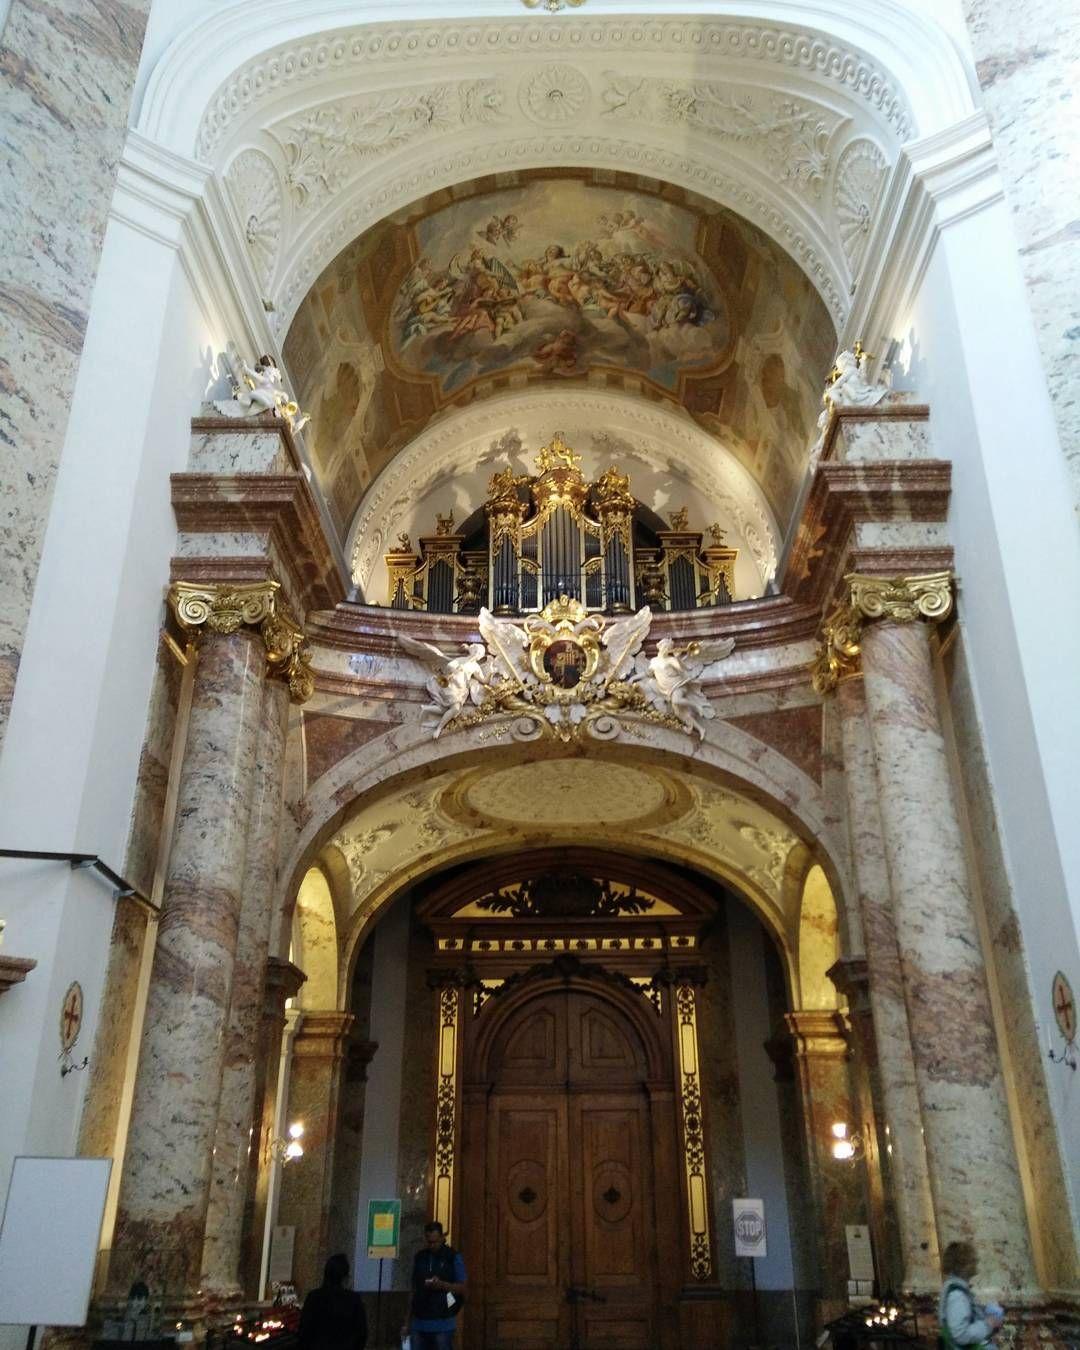 inside the st charles church in vienna an absolute must see 2europeans austria vienna wien europe church views nature naturephotography - Must See Wien